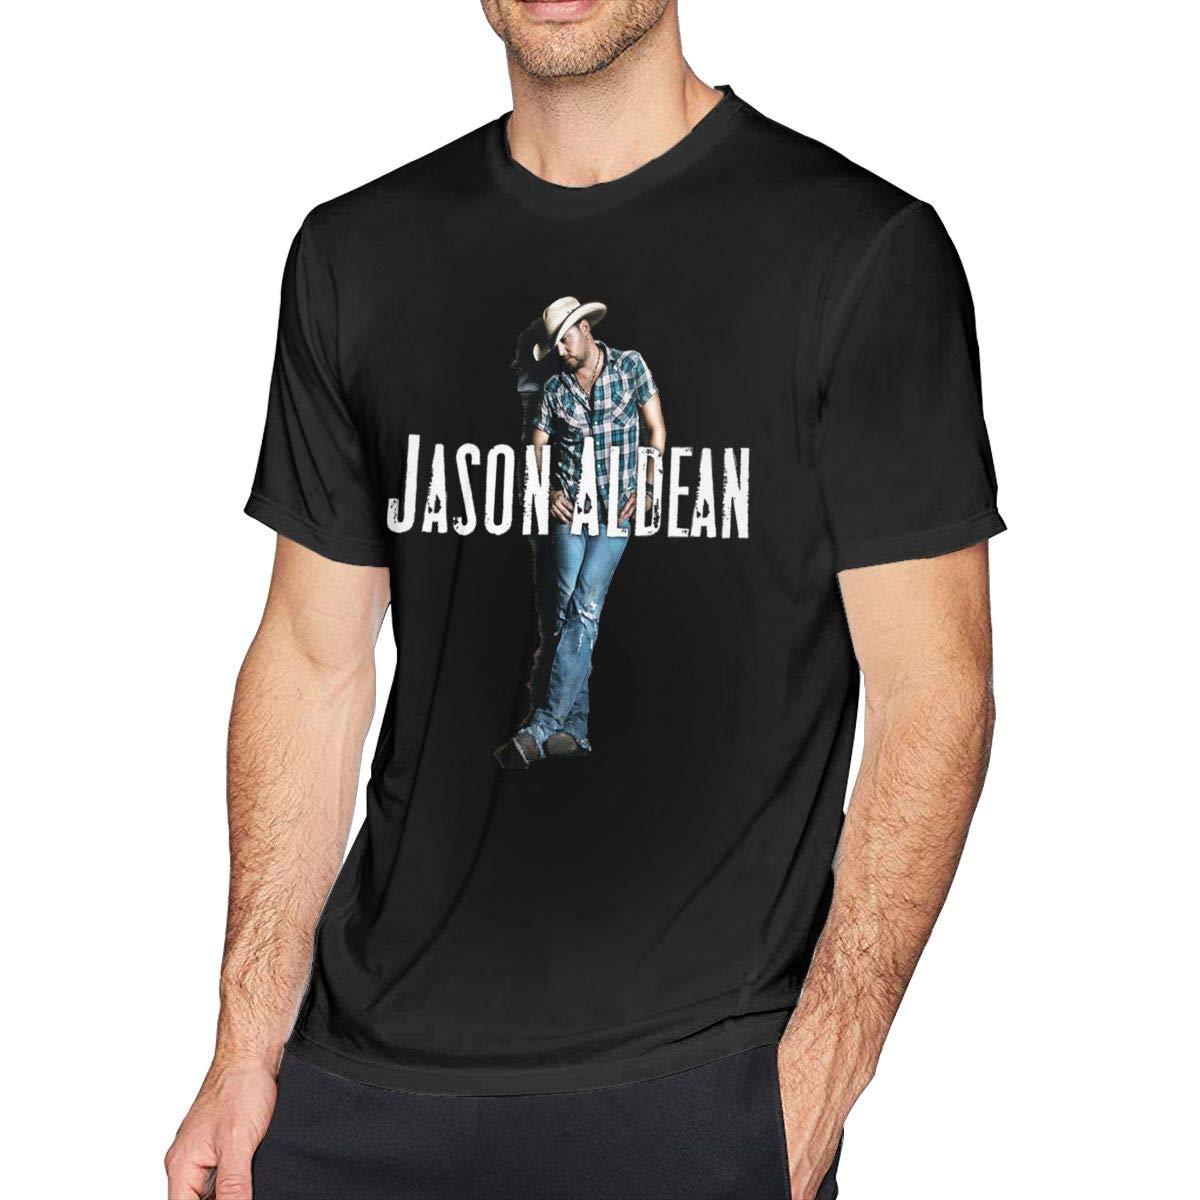 Jason Aldean My Kinda Party Comfort T-shirt Black